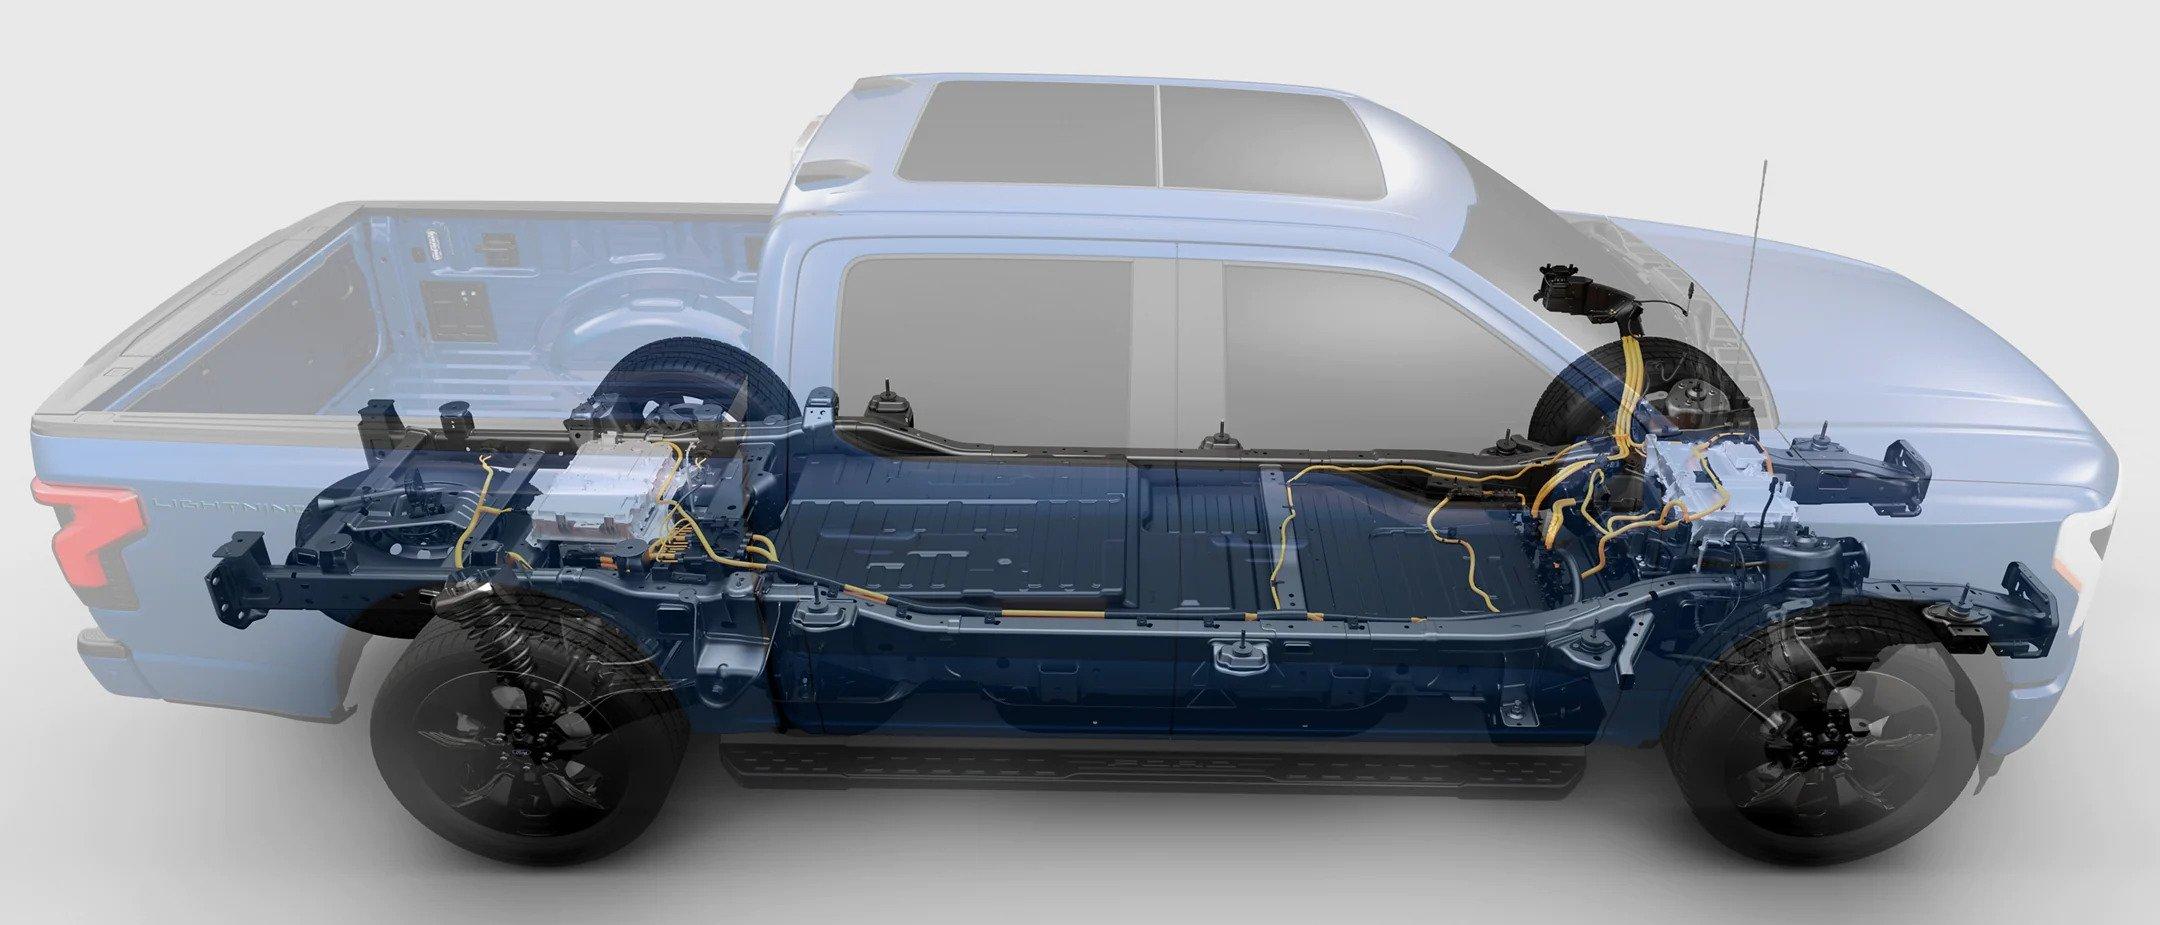 100% Battery powered Ford F-150 Lightning